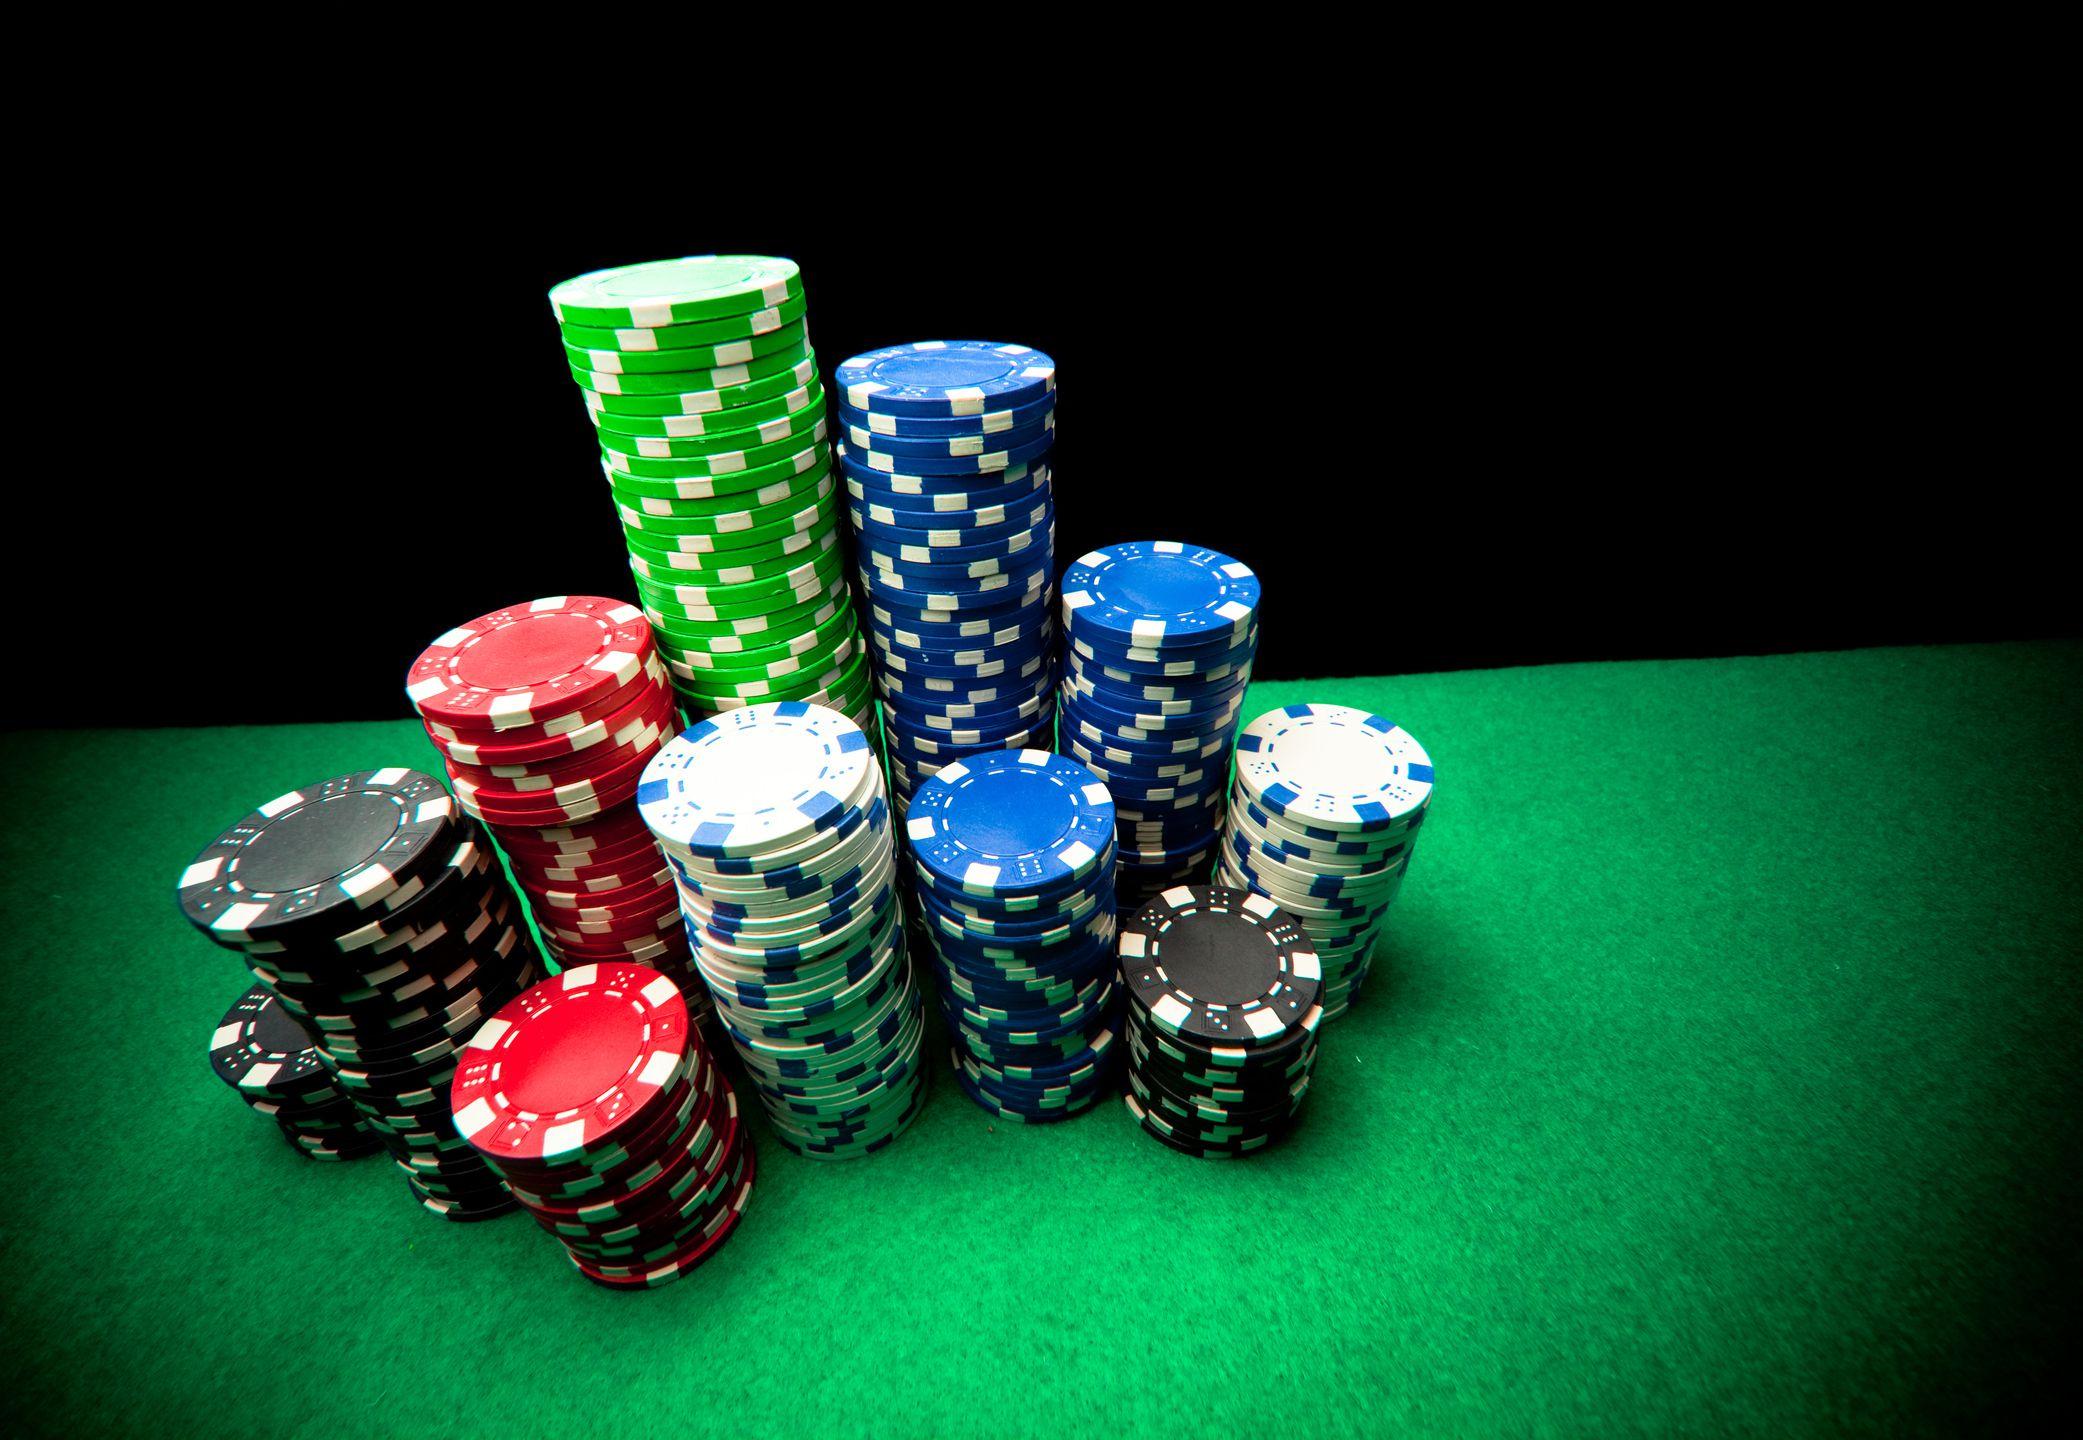 Deep Stack Poker Tournament Strategy - 100+ Big Blinds